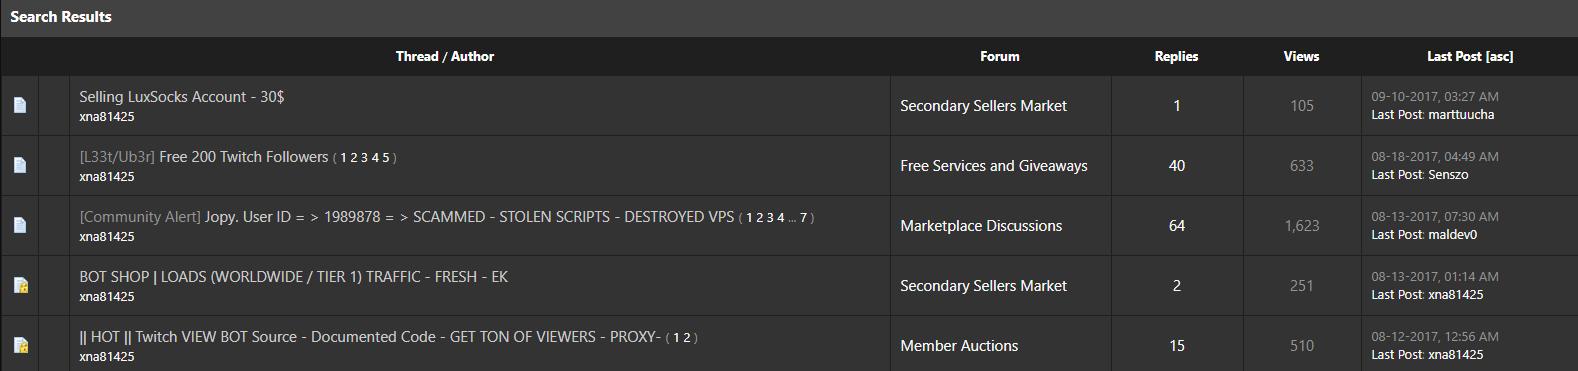 TwitchHelper Com - Twitch View Bot + Free Proxies & Account Creator